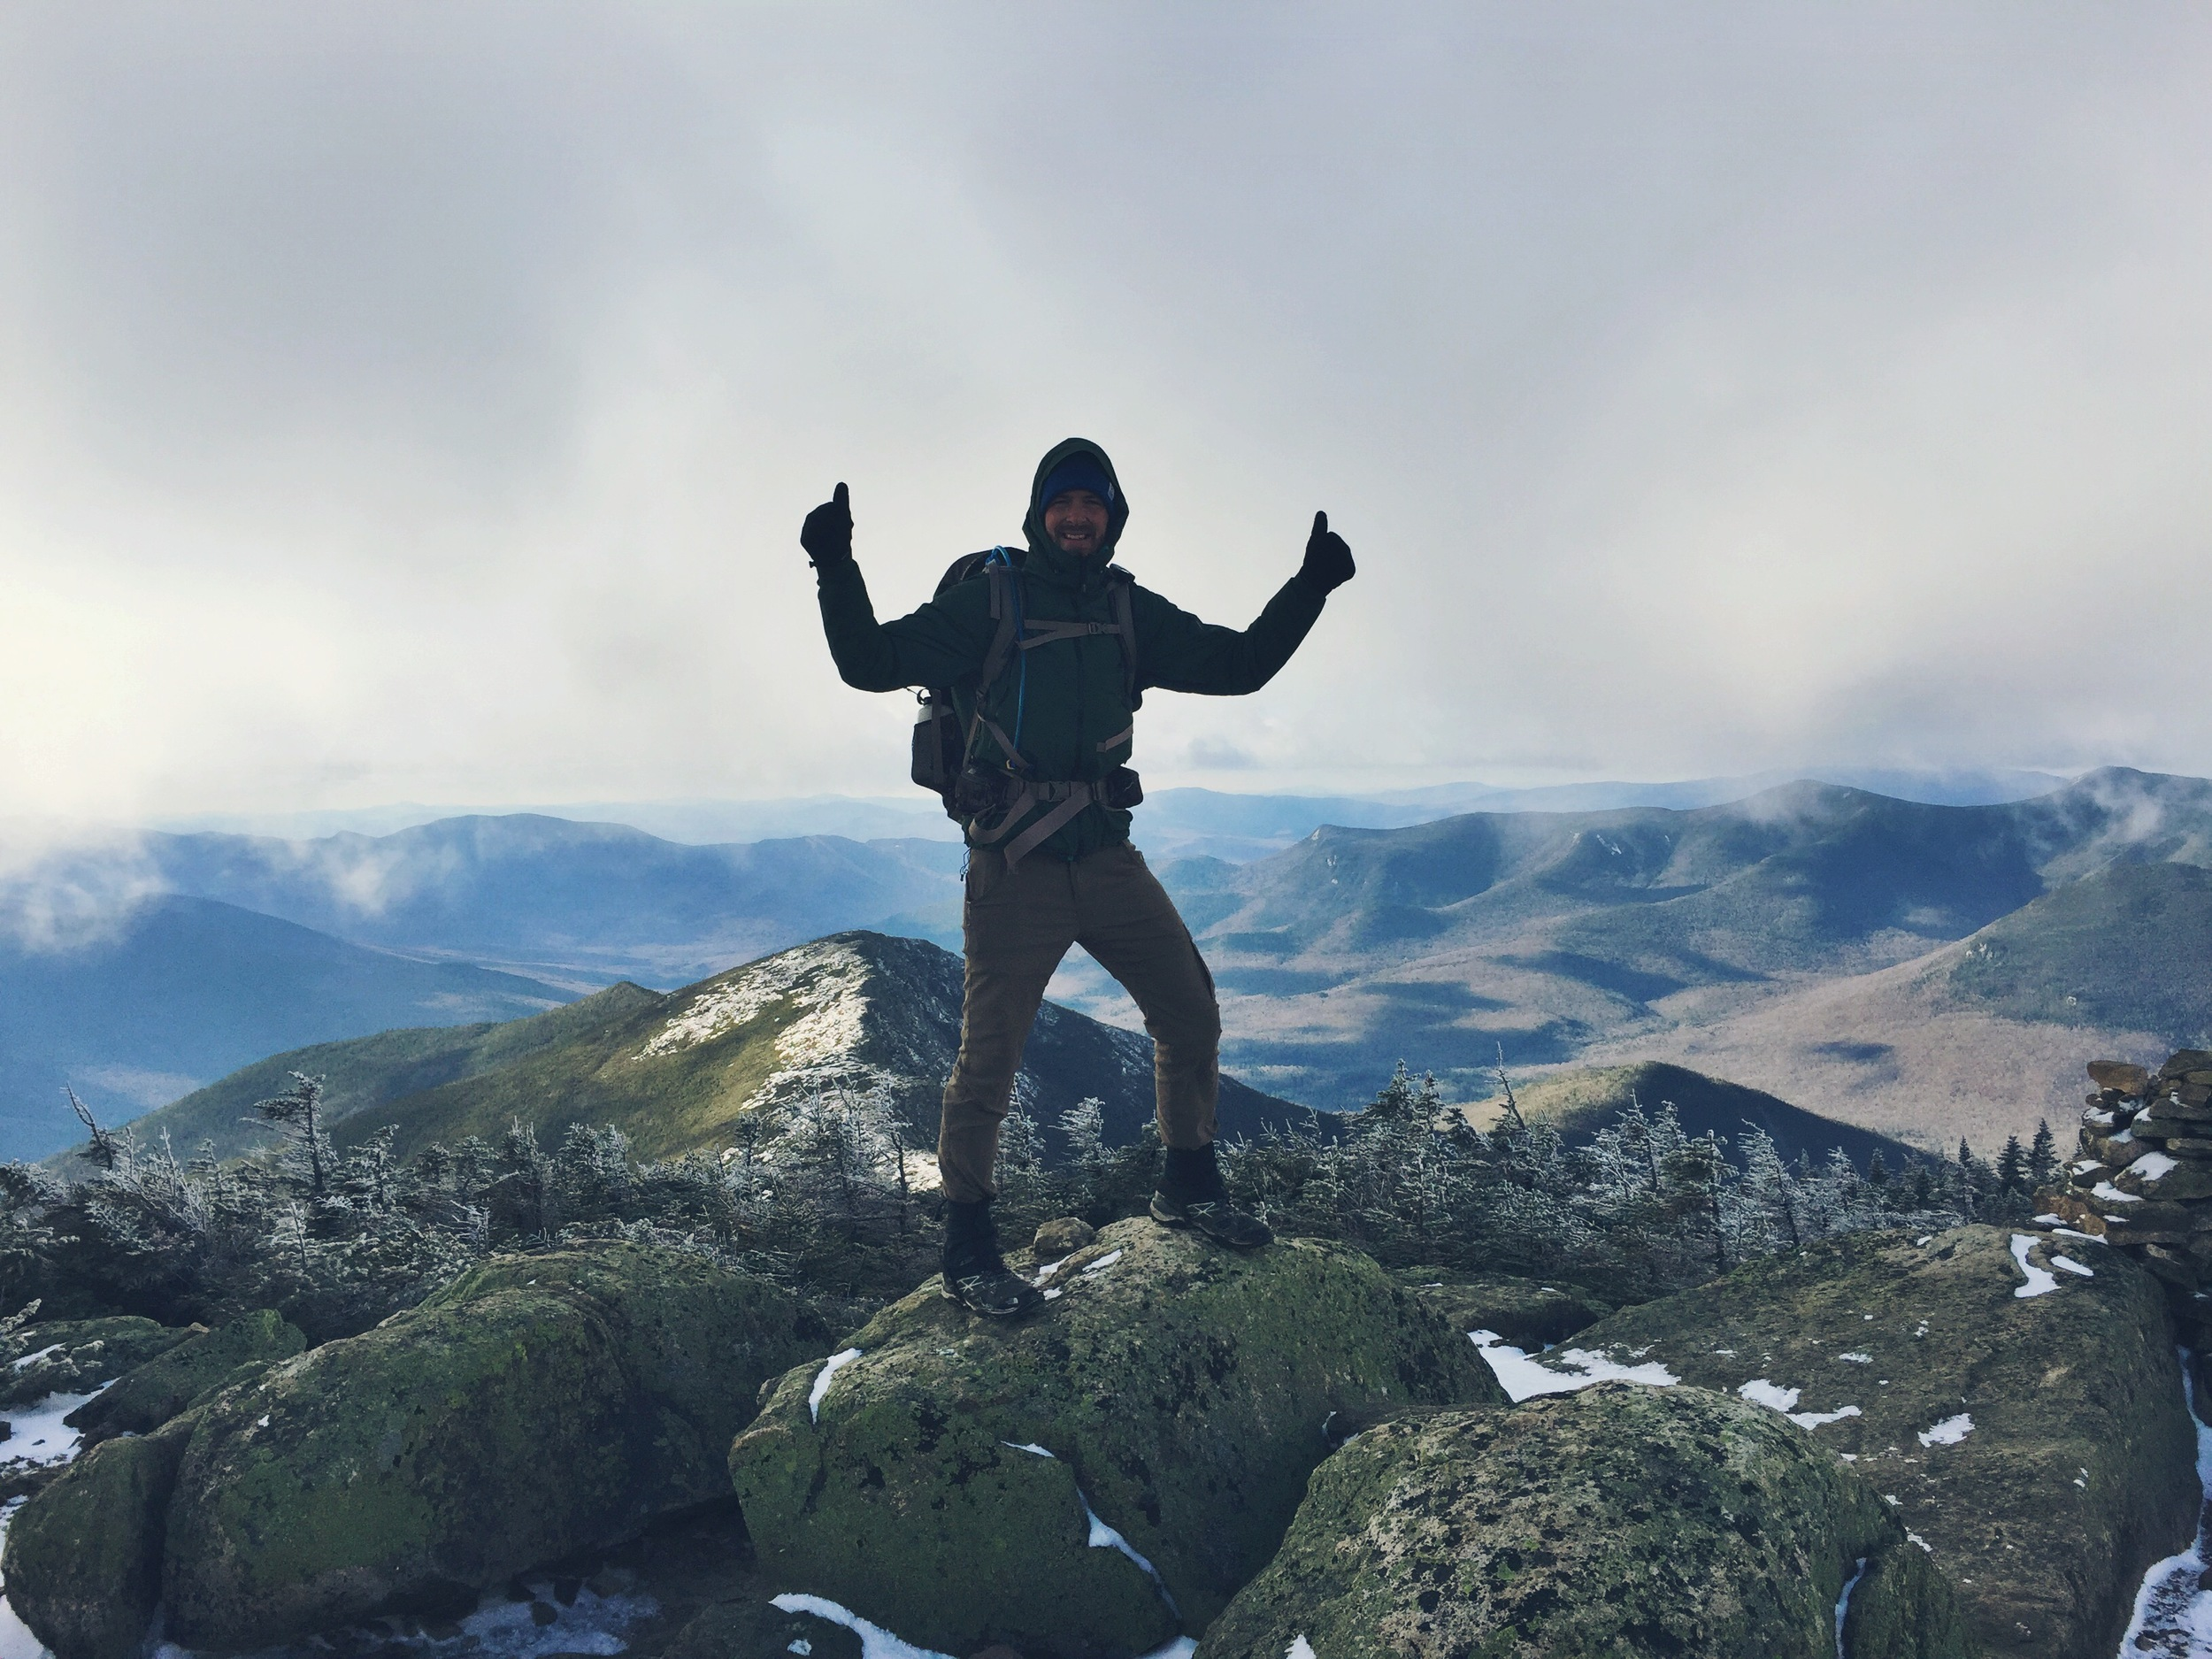 Teton at the top of Mt. Bond, the Bondcliffs sit below him in the distance.